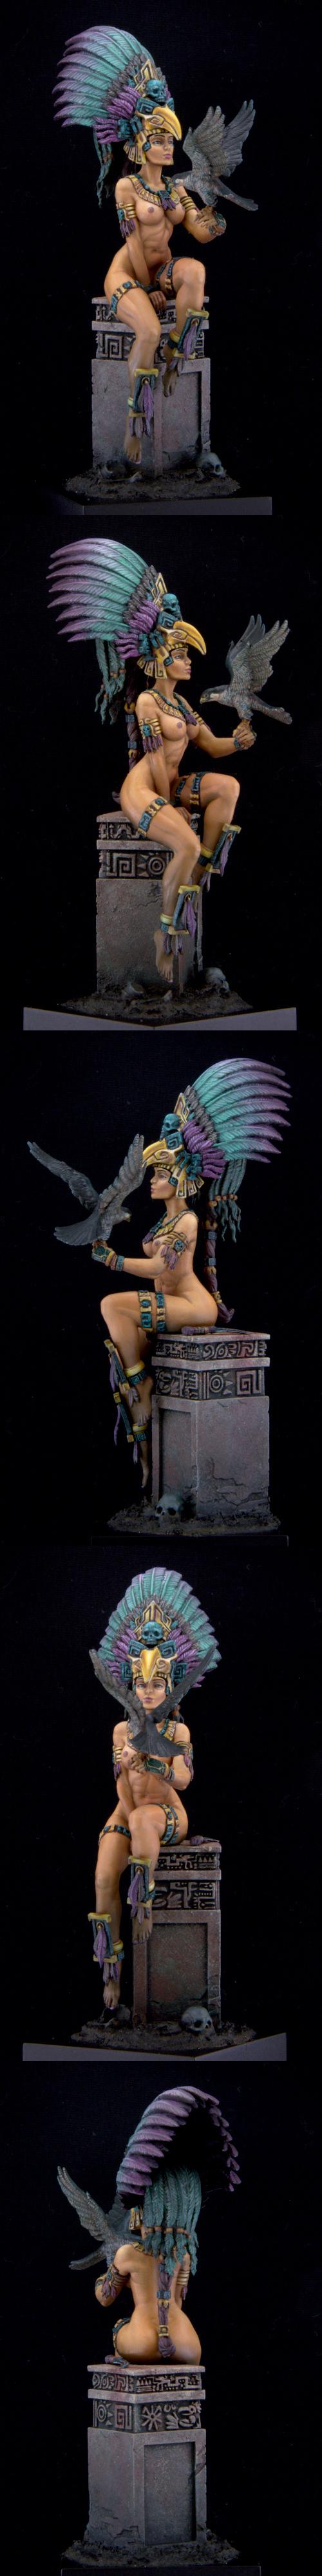 Aztec Priestess 75mm by First Legion